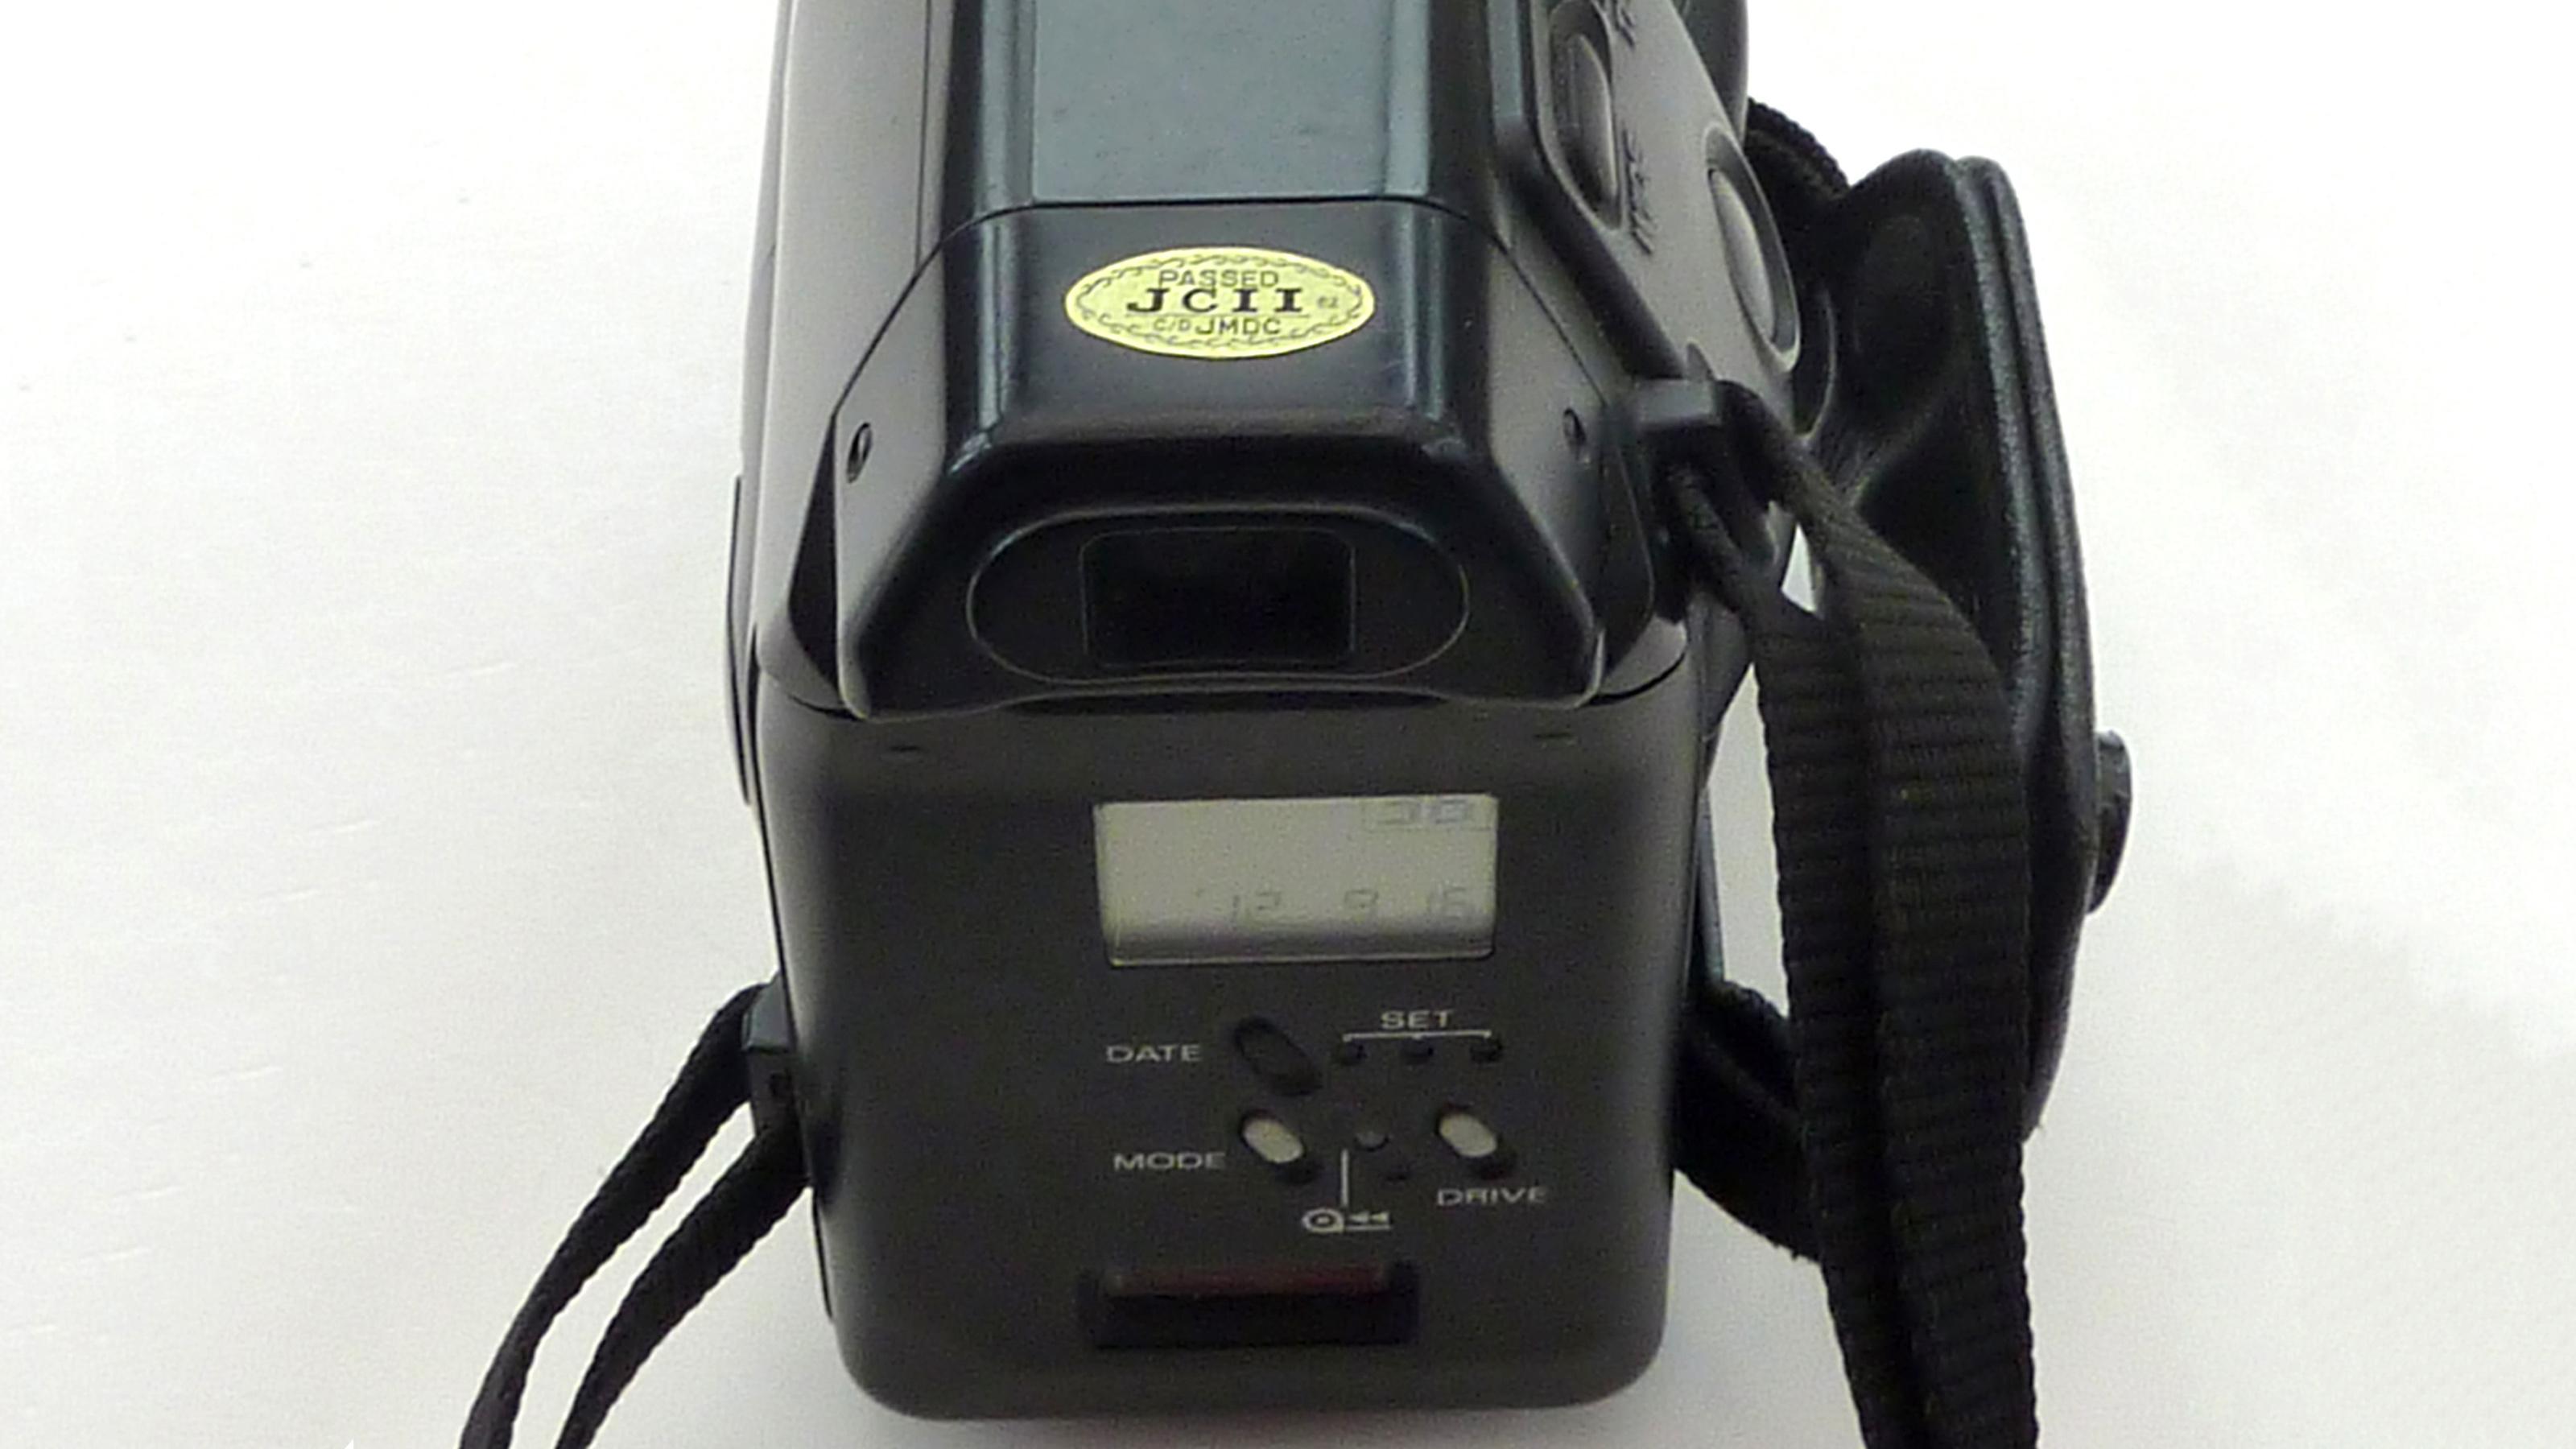 The back of the Kyocera Samurai half-frame camera